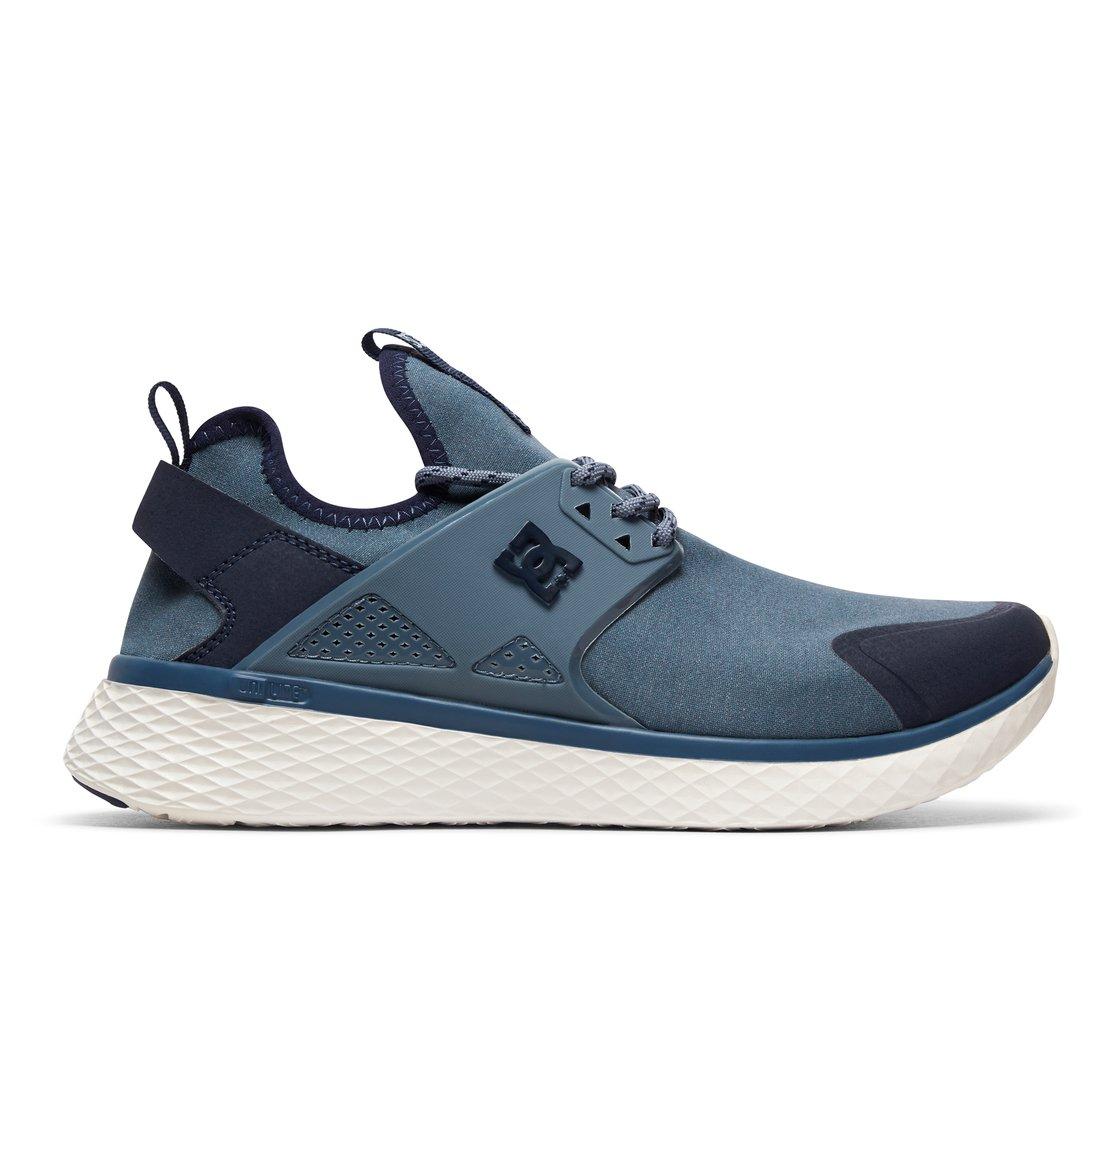 7ae188b0edd 0 Meridian Prestige - Baskets pour Homme Bleu ADYS700139 DC Shoes